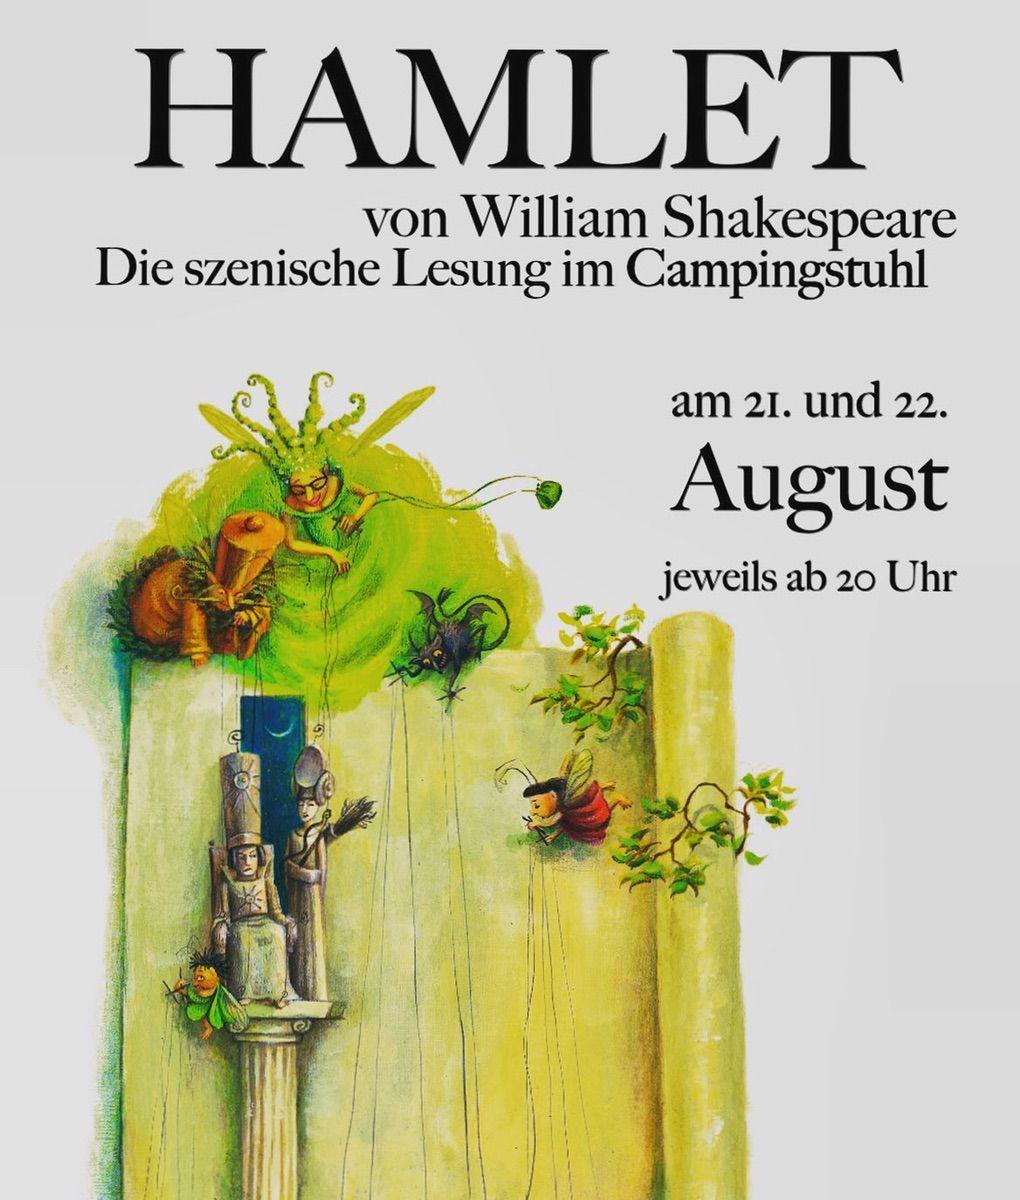 Kletterwald Schorfheide, Schorfheide, Barnim, Bernau LIVE